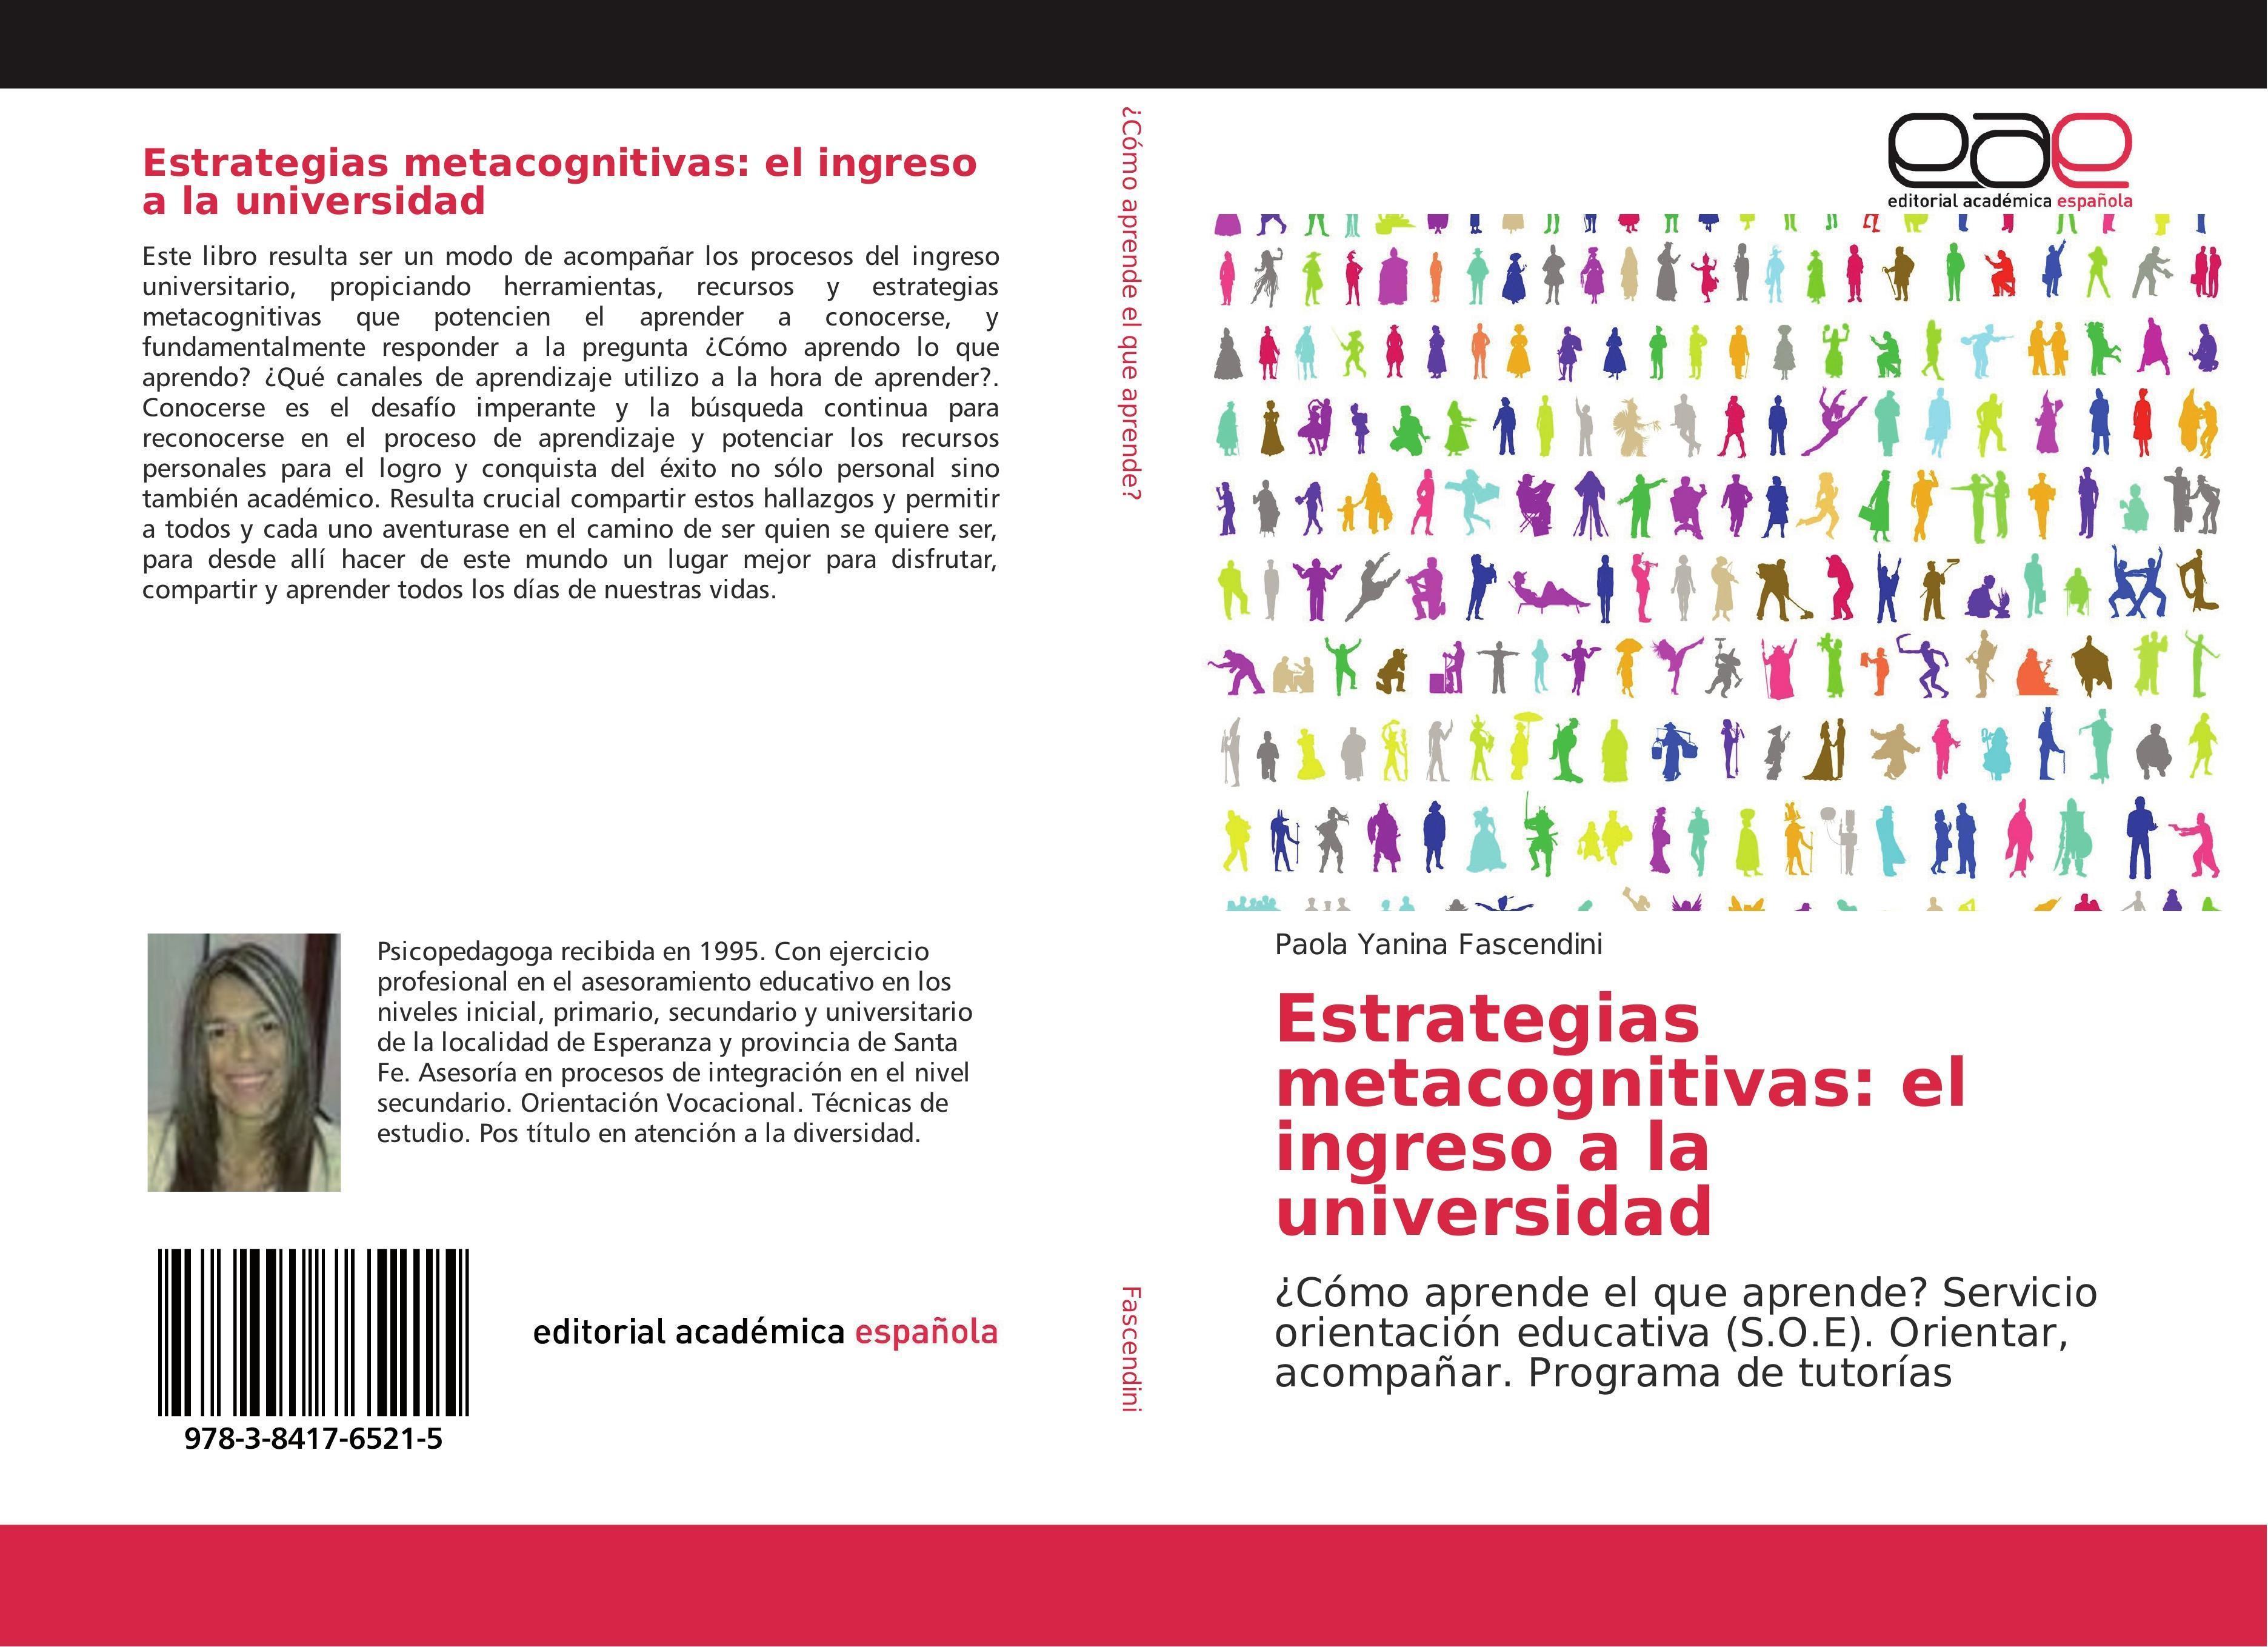 Paola Yanina Fascendini / Estrategias metacognitivas: el ingre ... 9783841765215